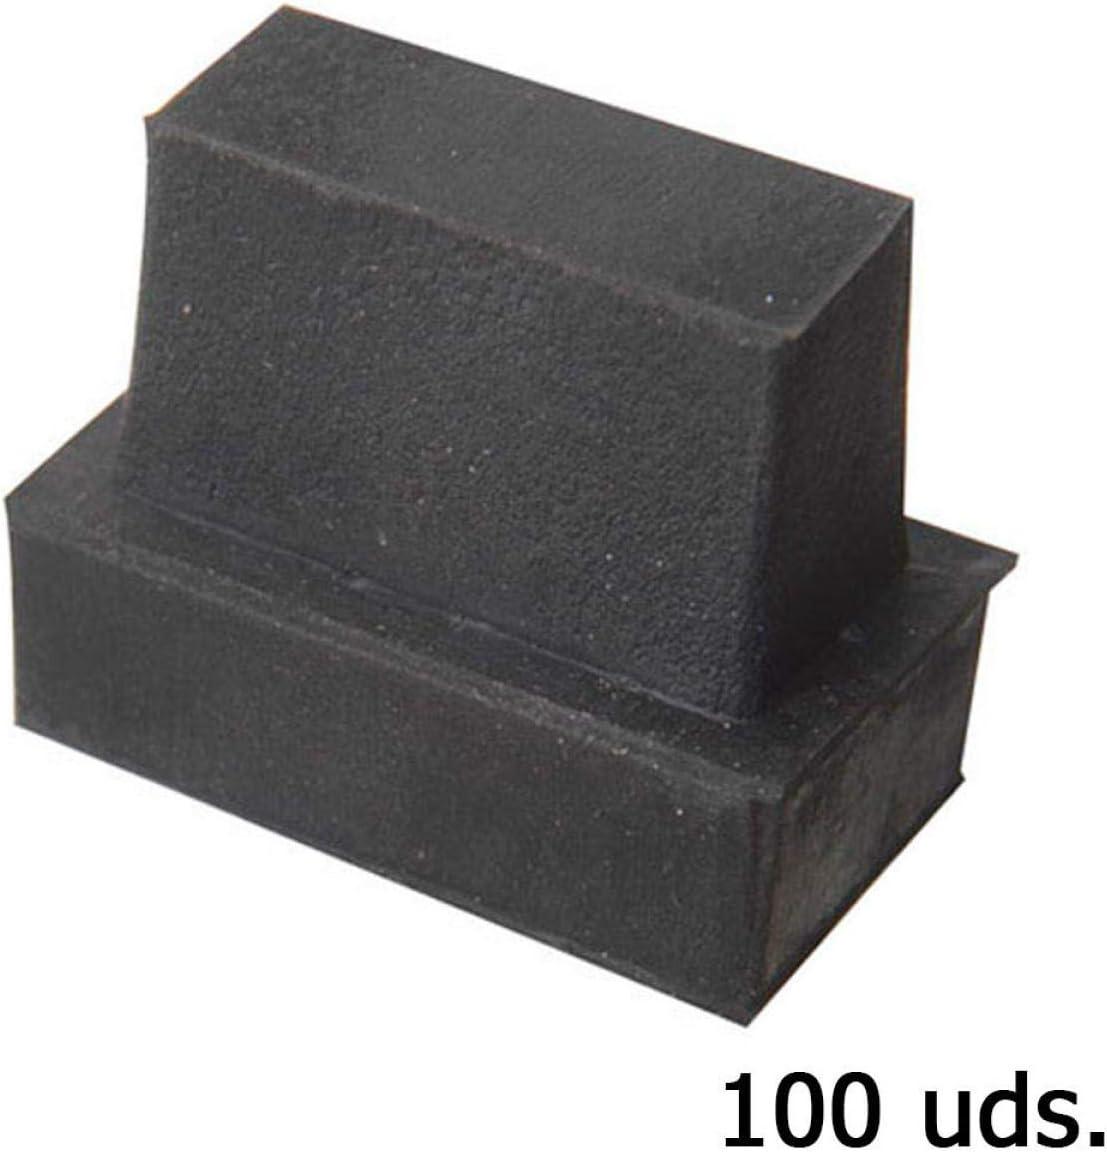 WOLFPACK LINEA PROFESIONAL 5330060 Contera Goma Rectangular 28 x 13 mm Bolsa 100 Unidades